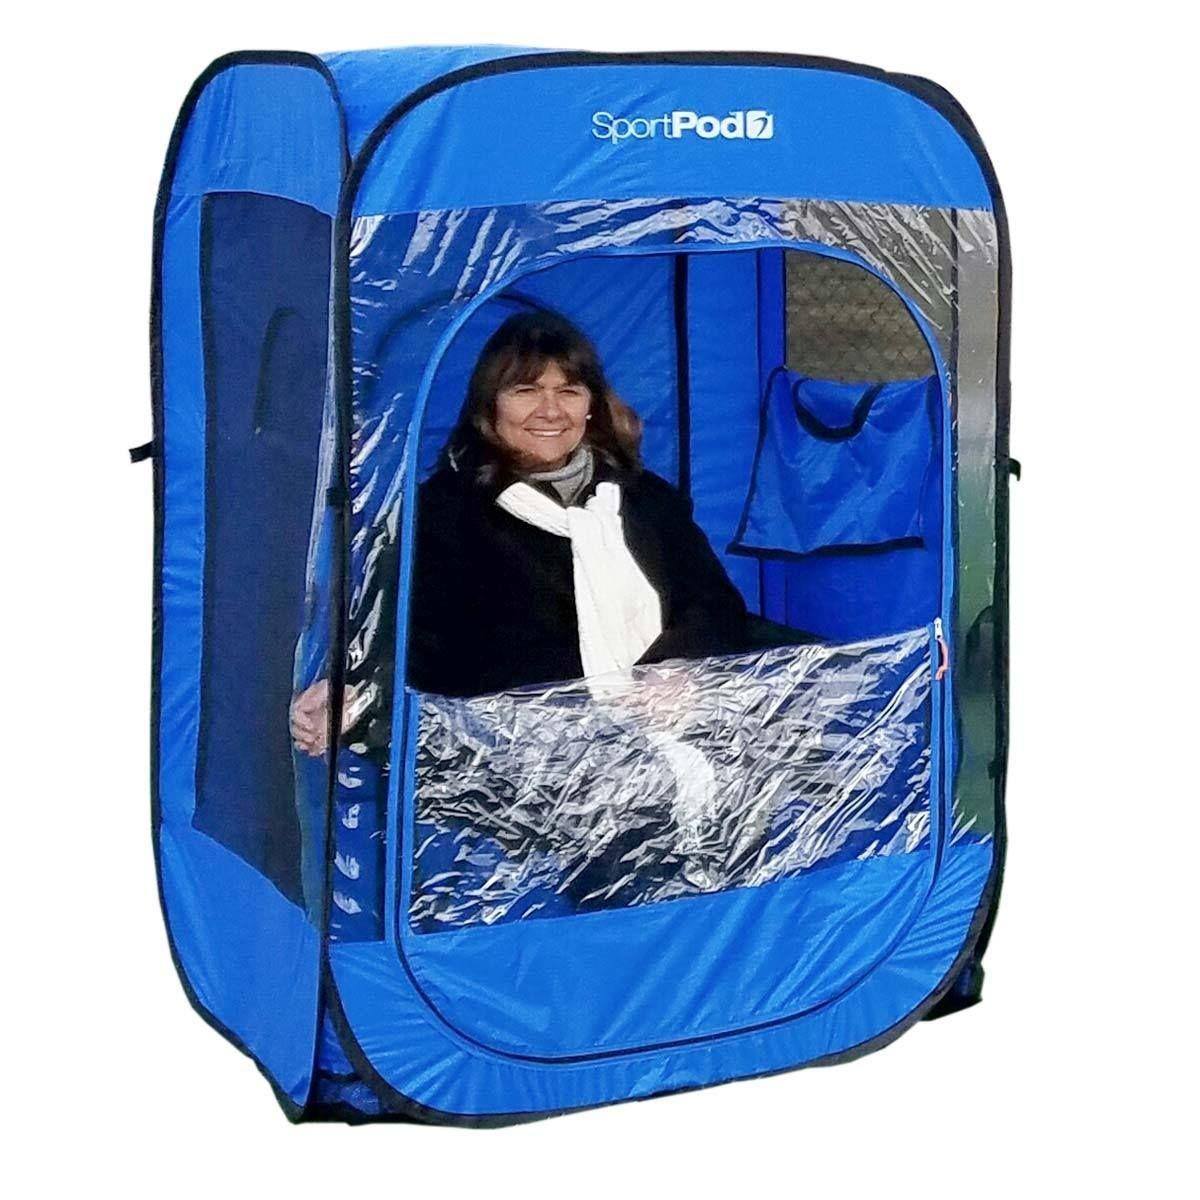 SoloPod™ AllWeather SportPod™ Pop Up Chair Tent Sports